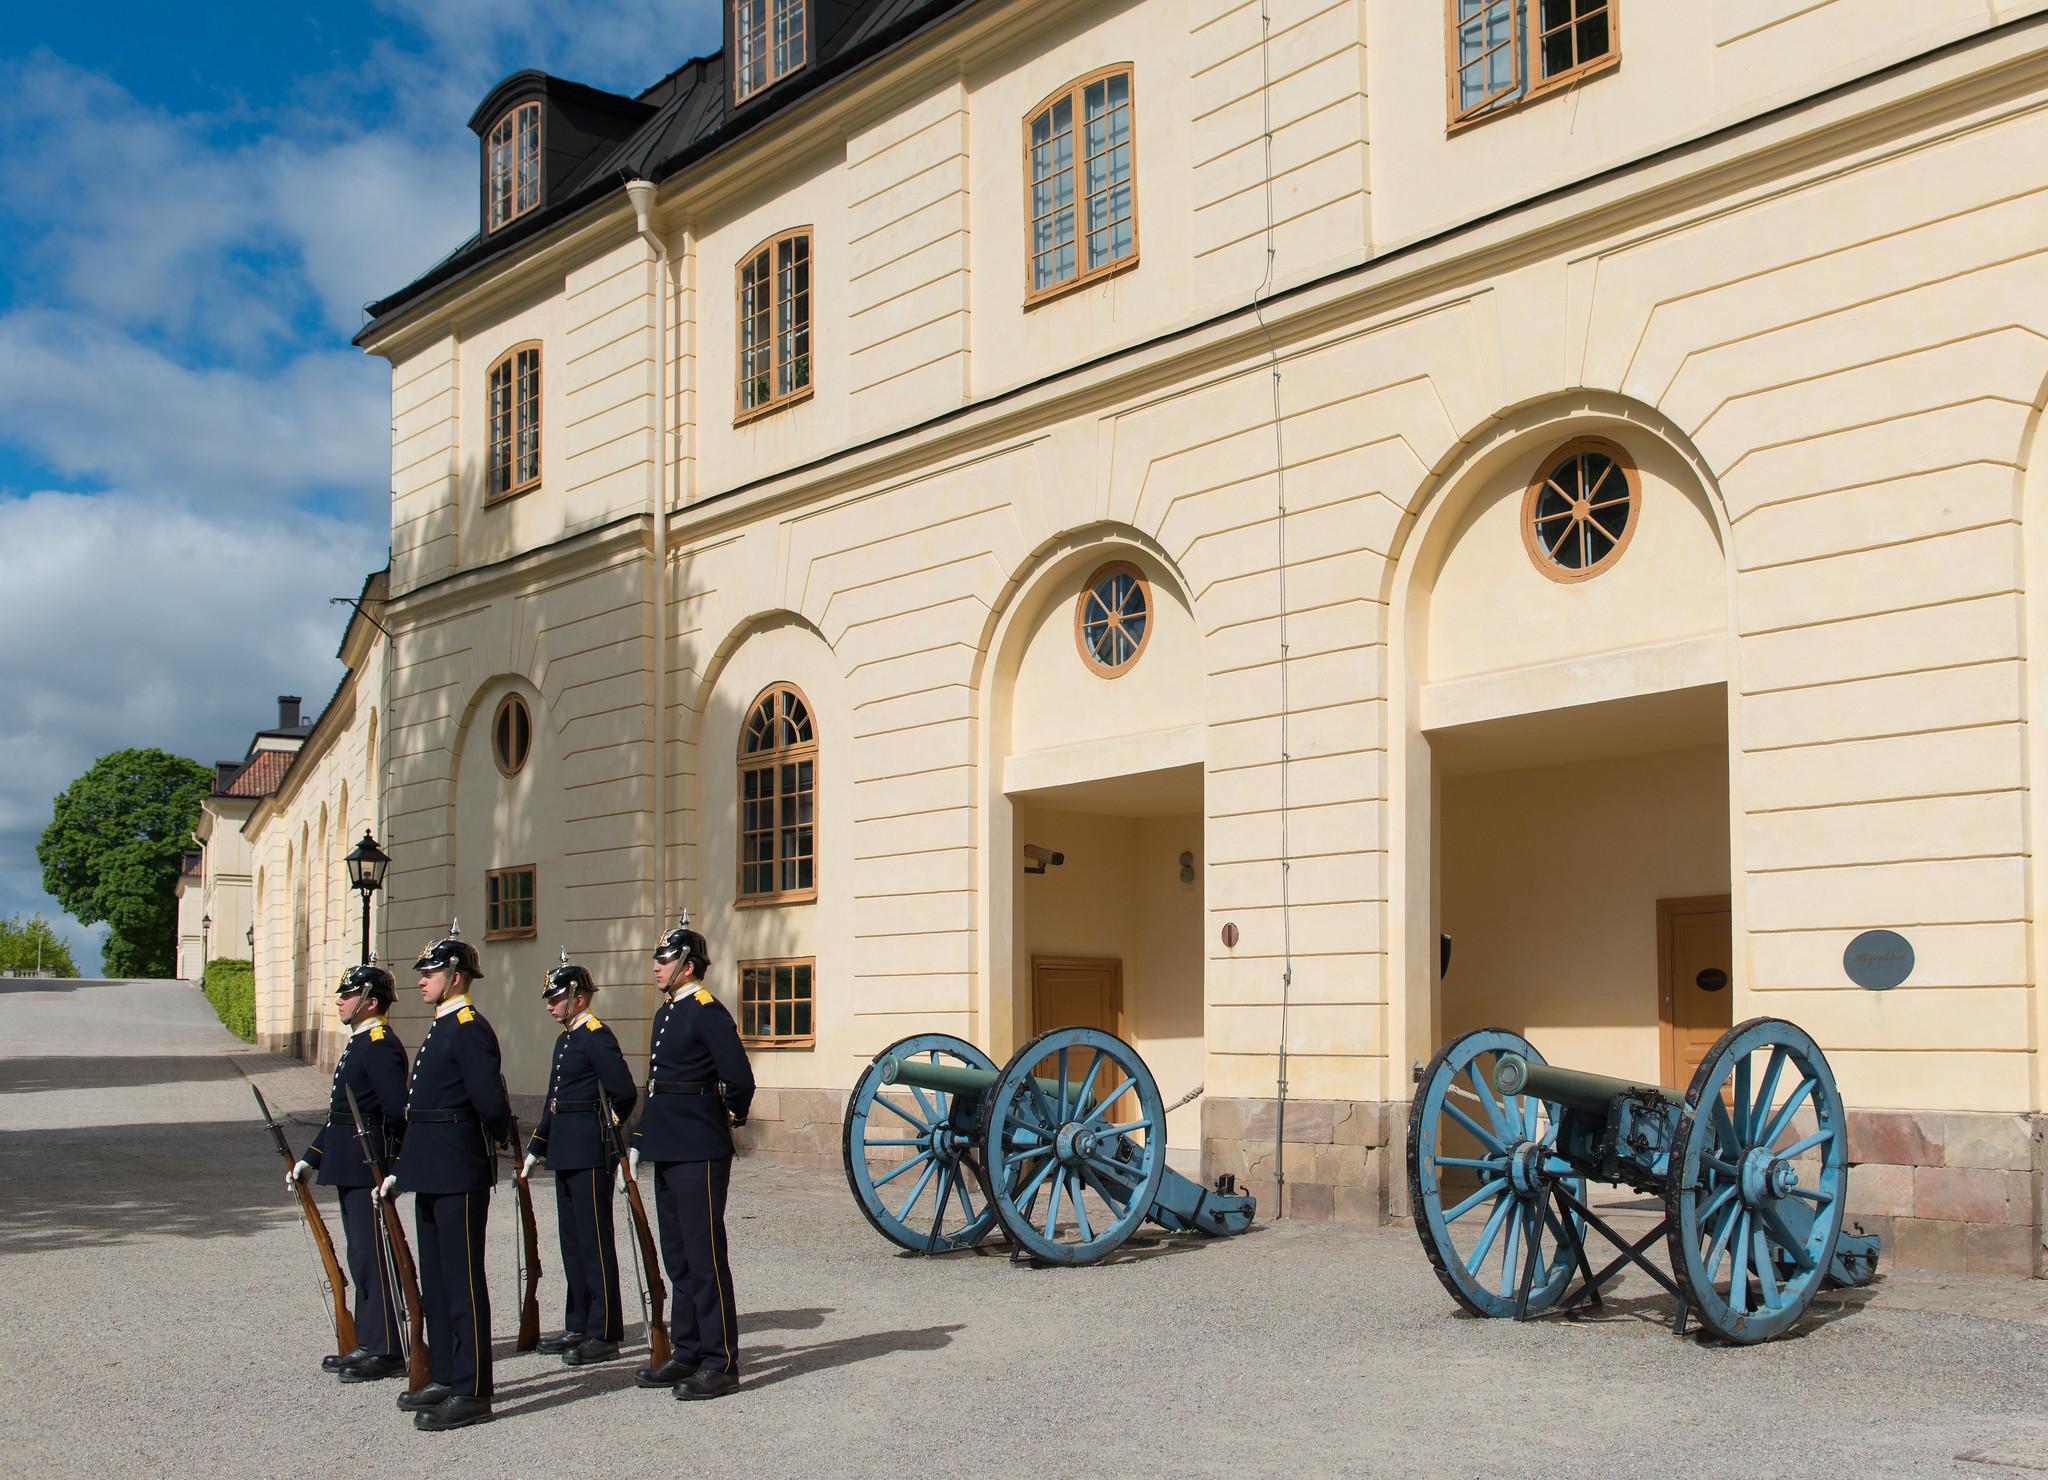 Drottningholm Palace Guards